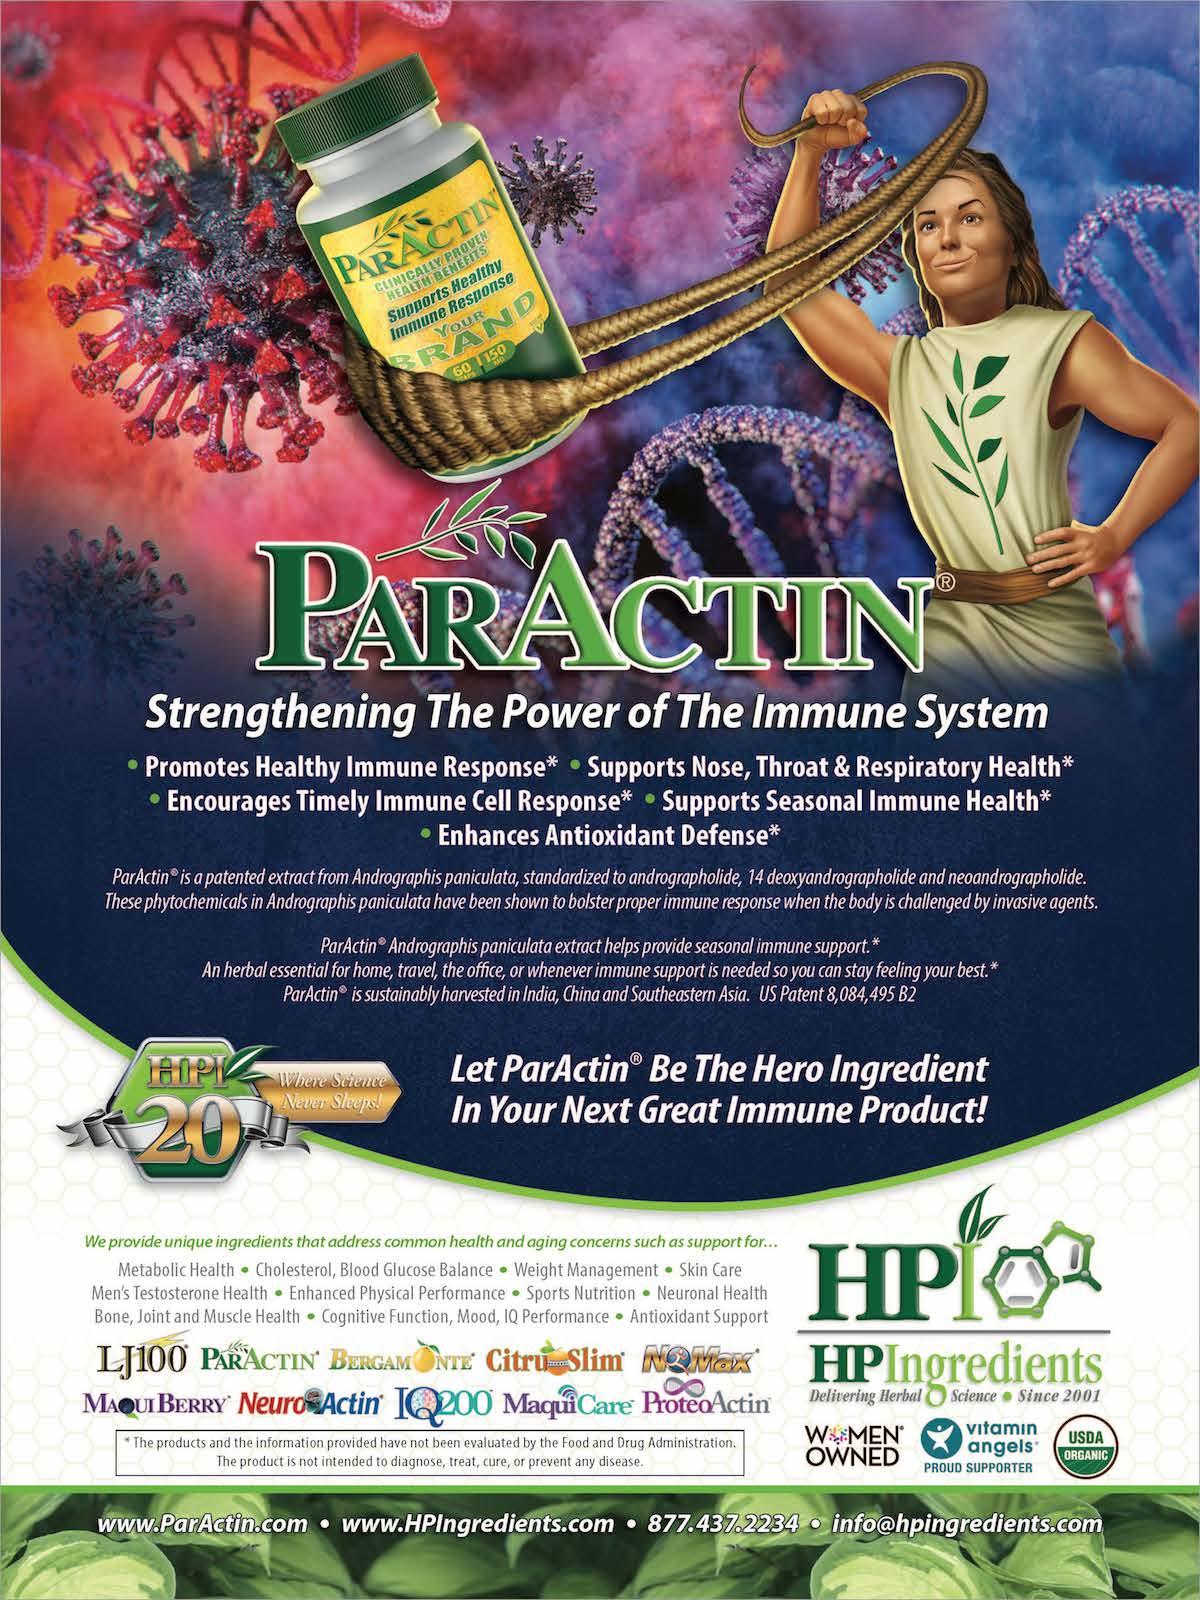 hpi_nutworld_fpg_paractin_11_20